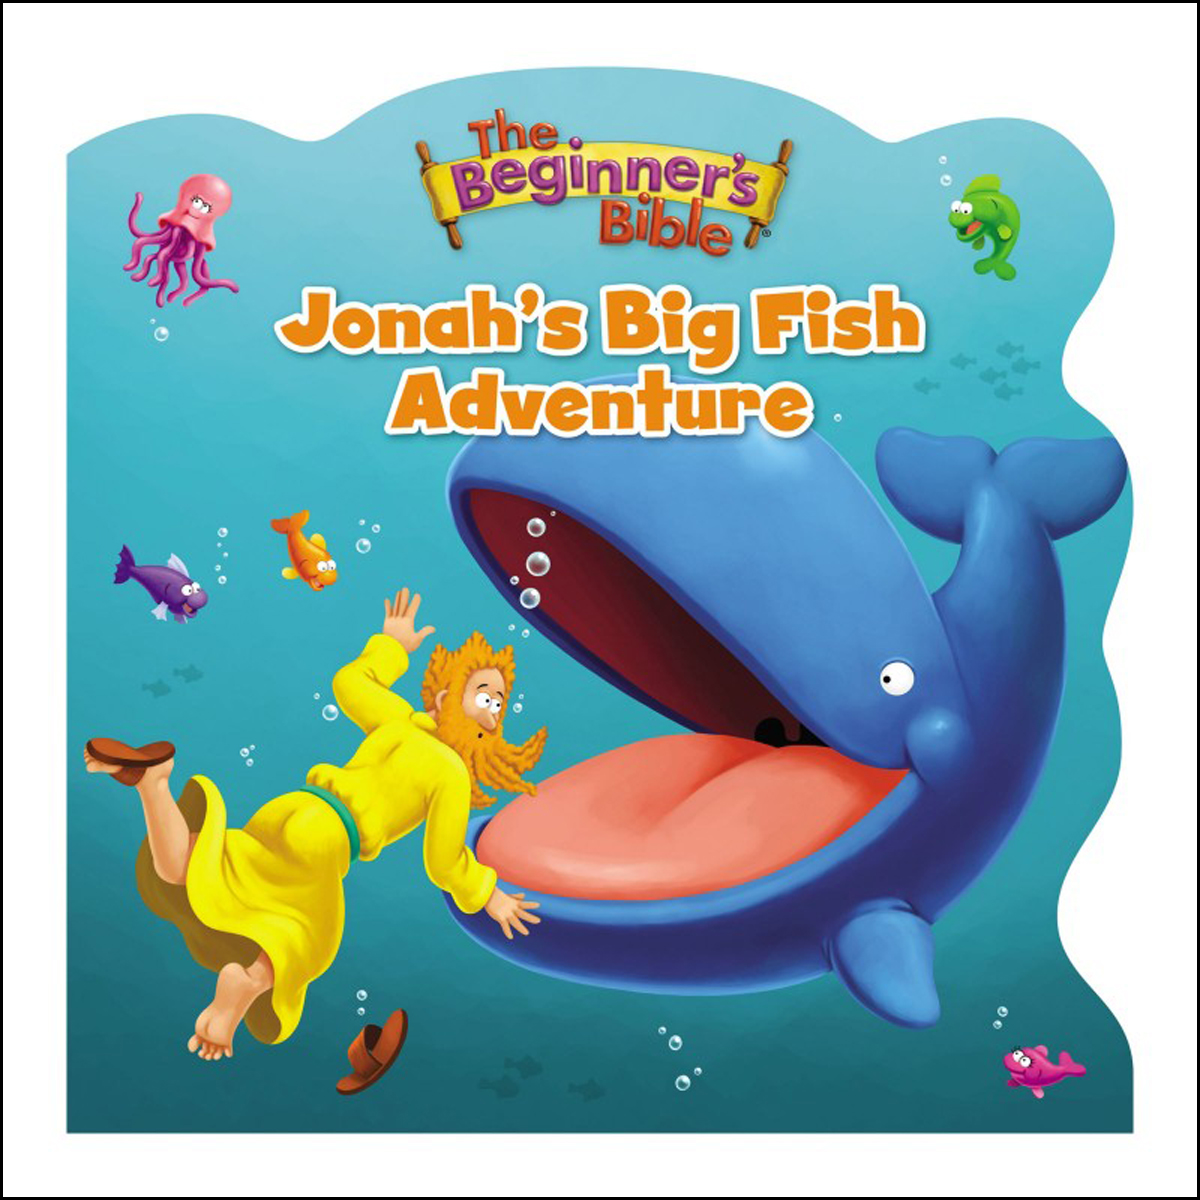 The Beginner's Bible Jonah's Big Fish Adventure (Hardcover)